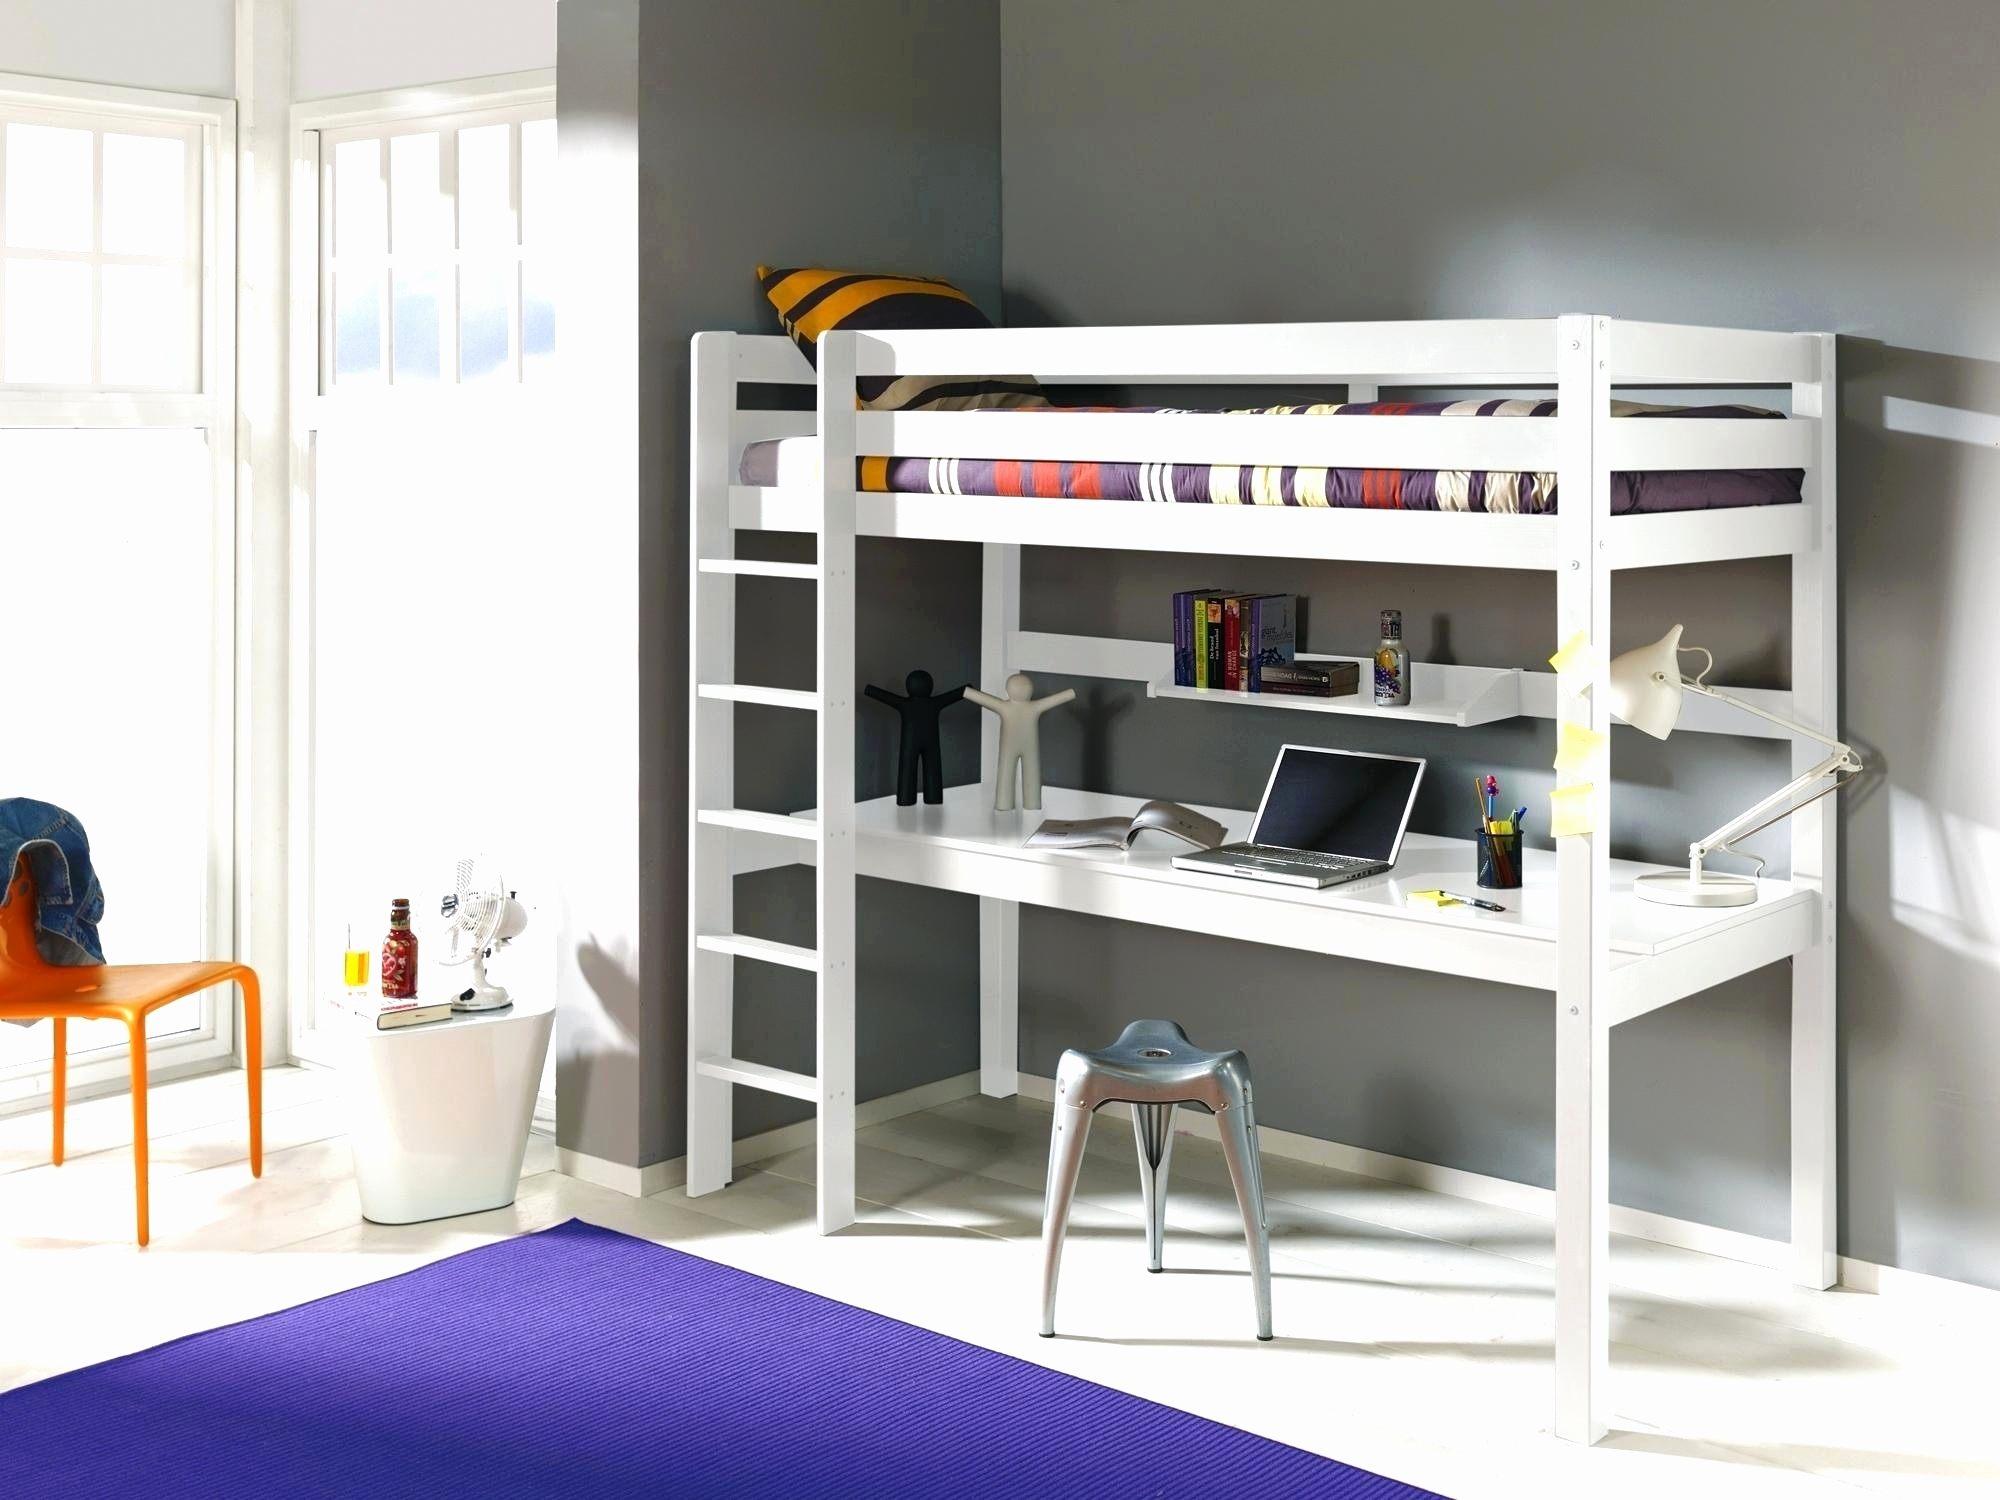 Lit Mezzanine Armoire Joli Lit Mezzanine Design Mezzanine Industrielle Elegant Lit Design Pas